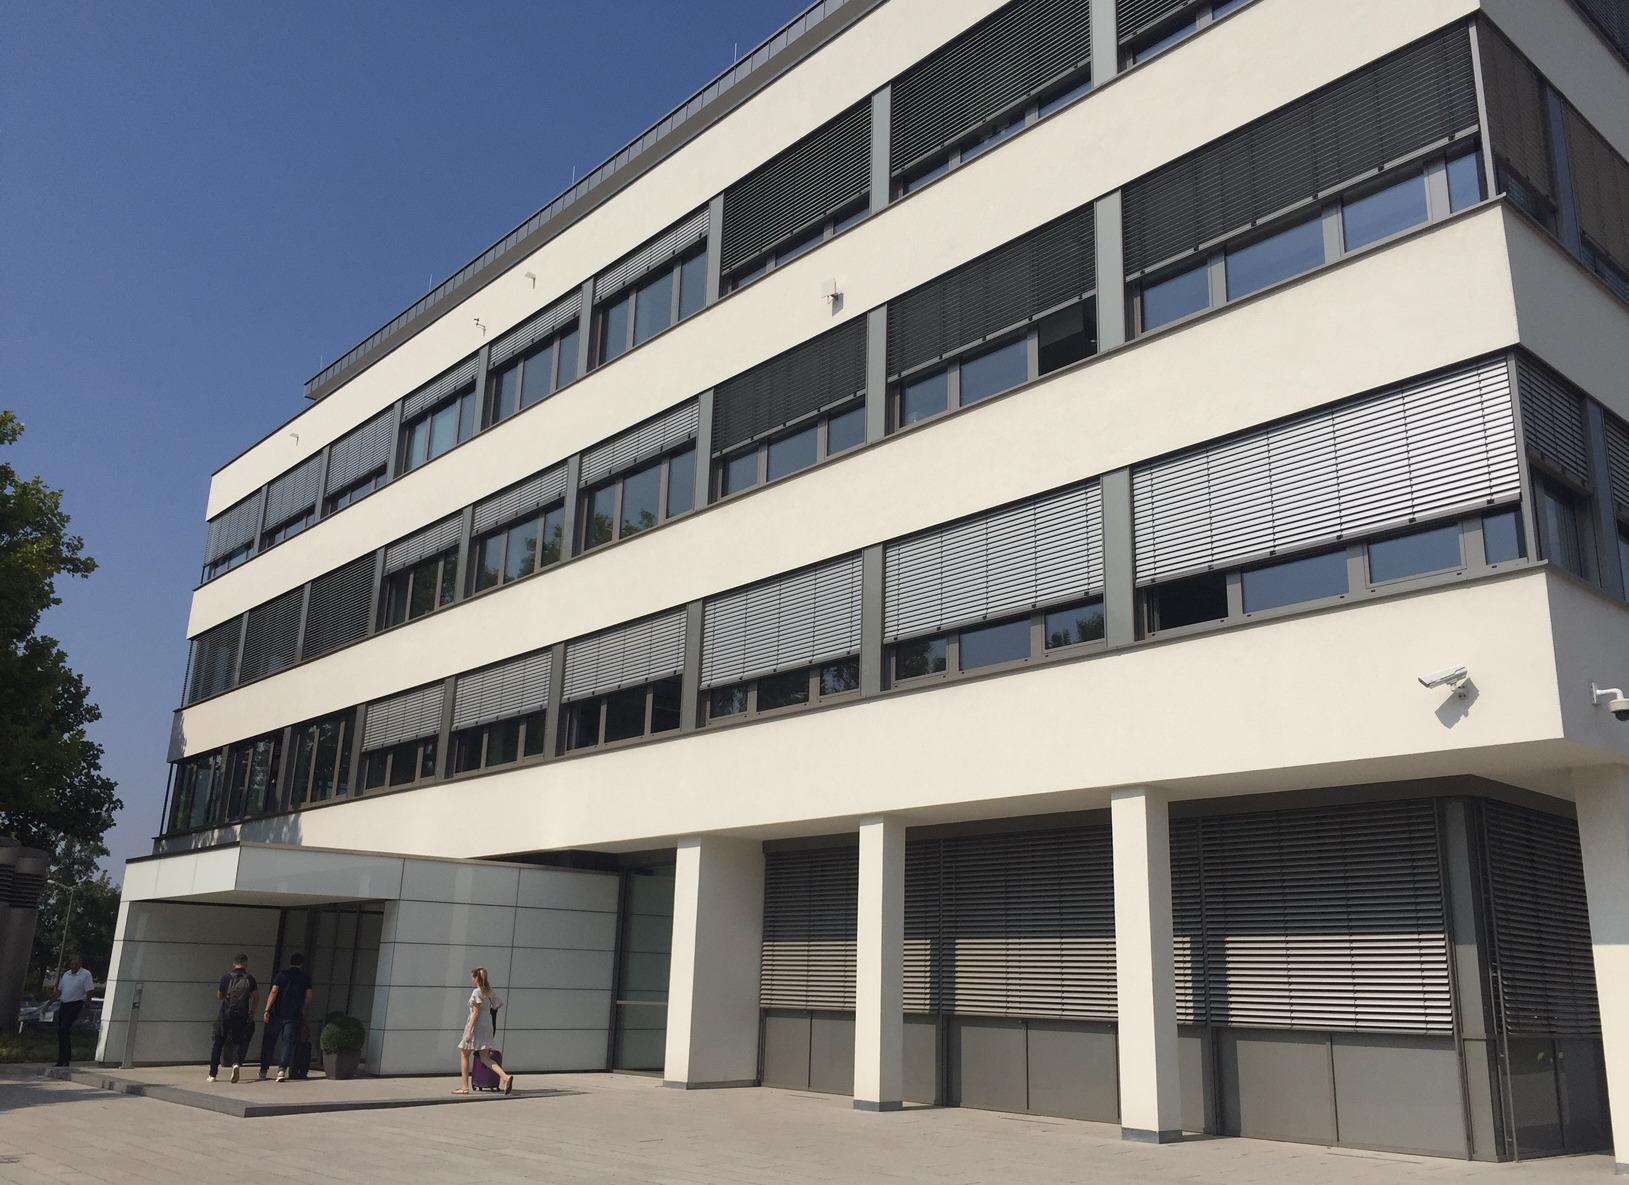 advantago GmbH & Co. KG